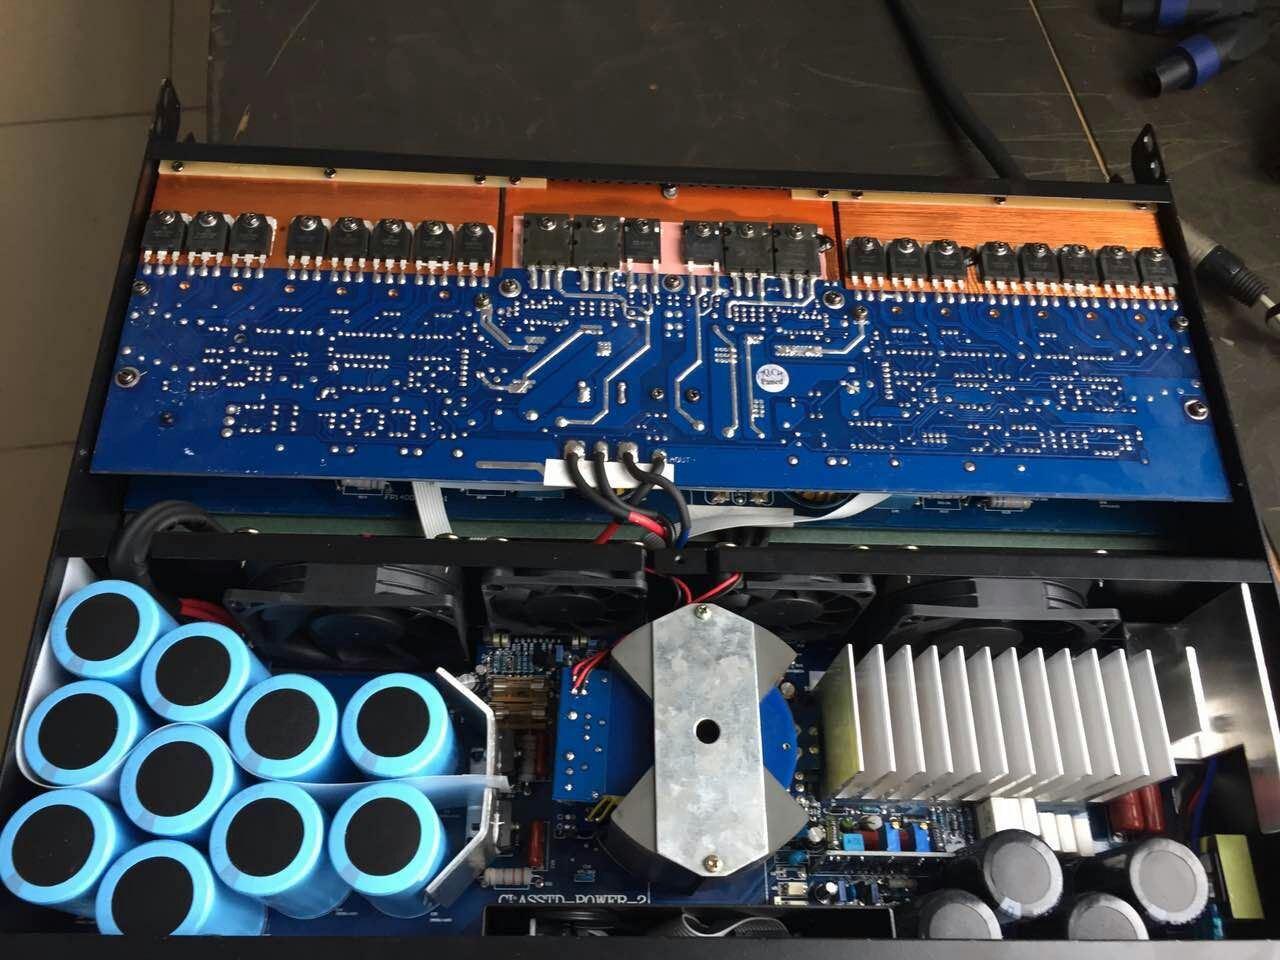 Profssional-Speaker-System-2CH-2200W-High-Power-Amplifier-Fp14000.jpg